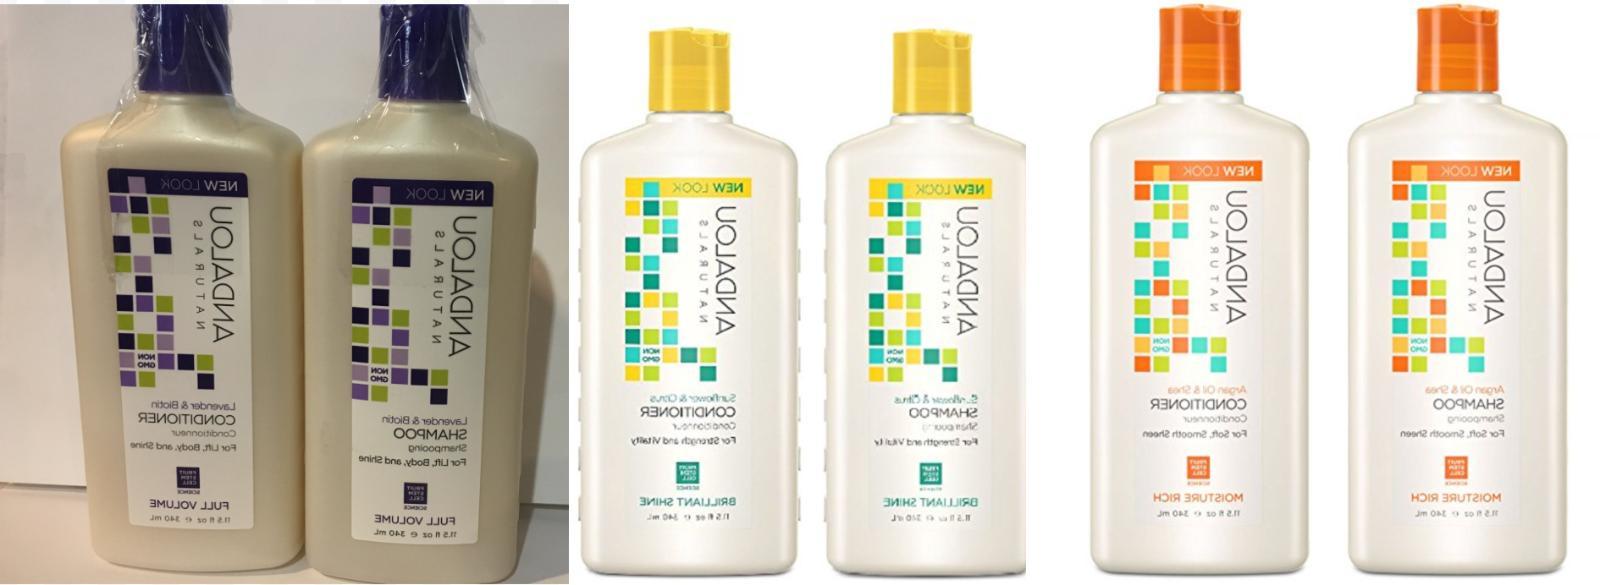 shampoo and conditioner bundle 11 5oz 340ml